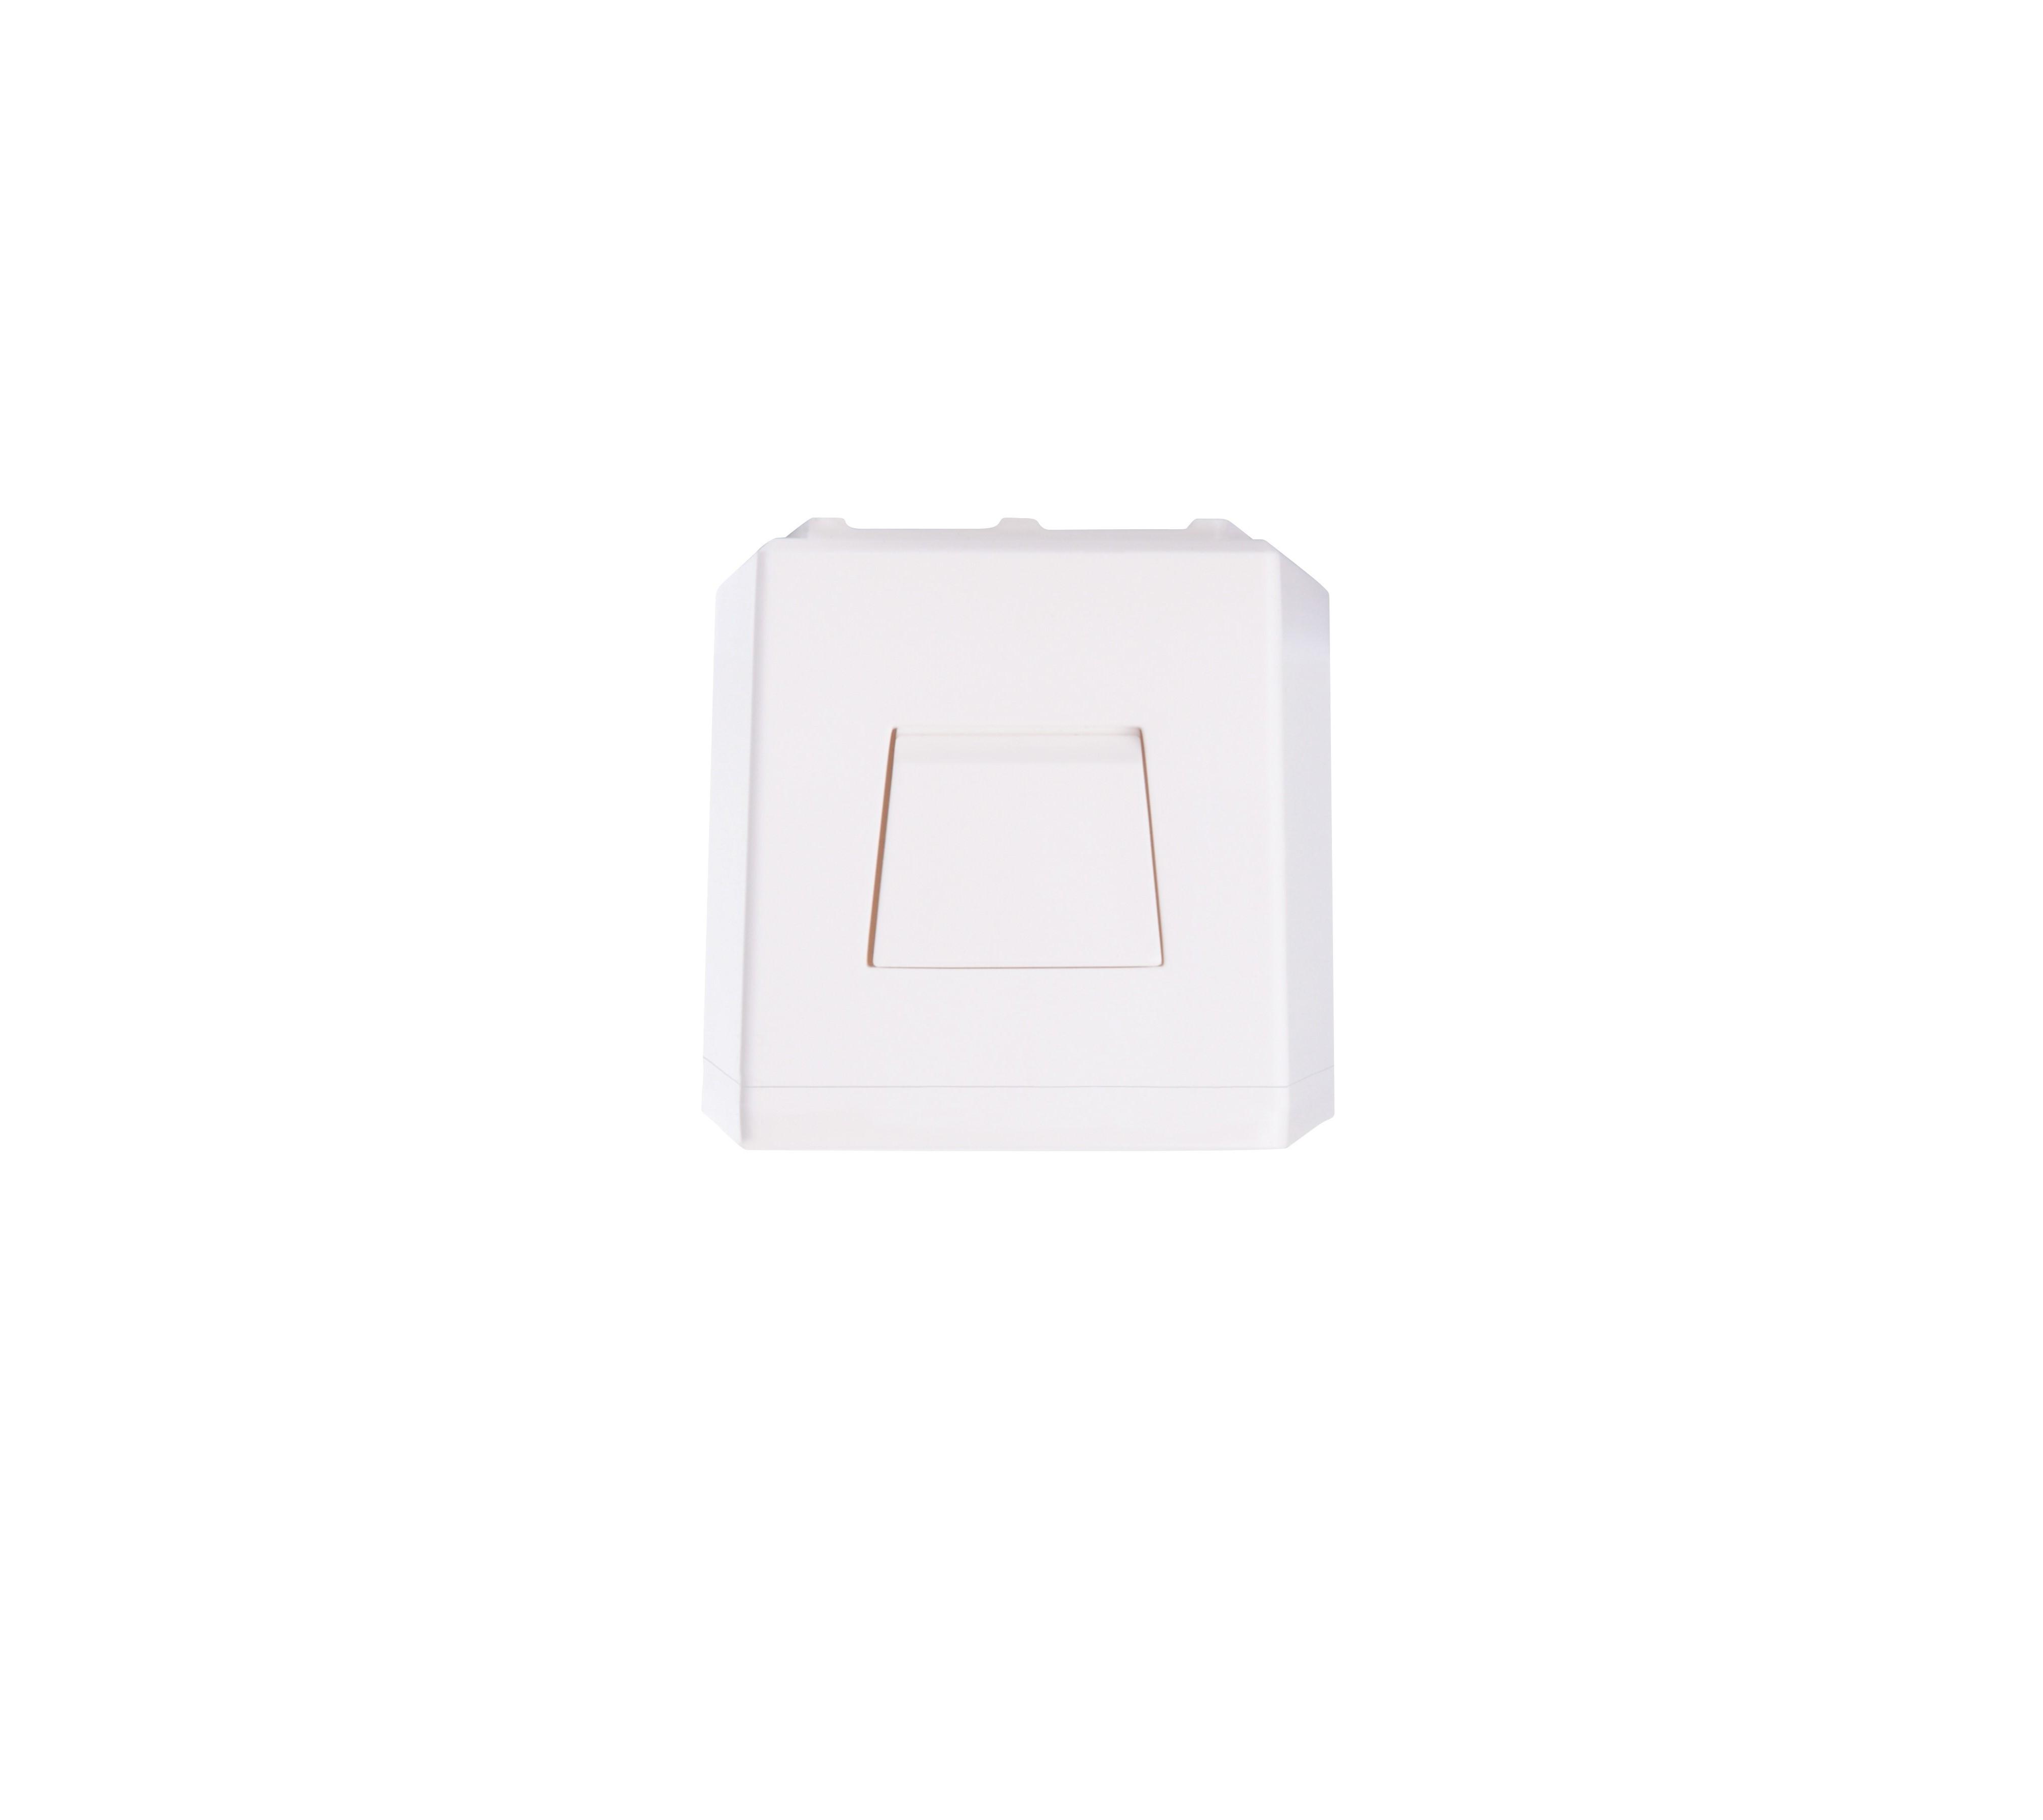 Lampa emergenta led Intelight 94752   3h mentinut test automat 1